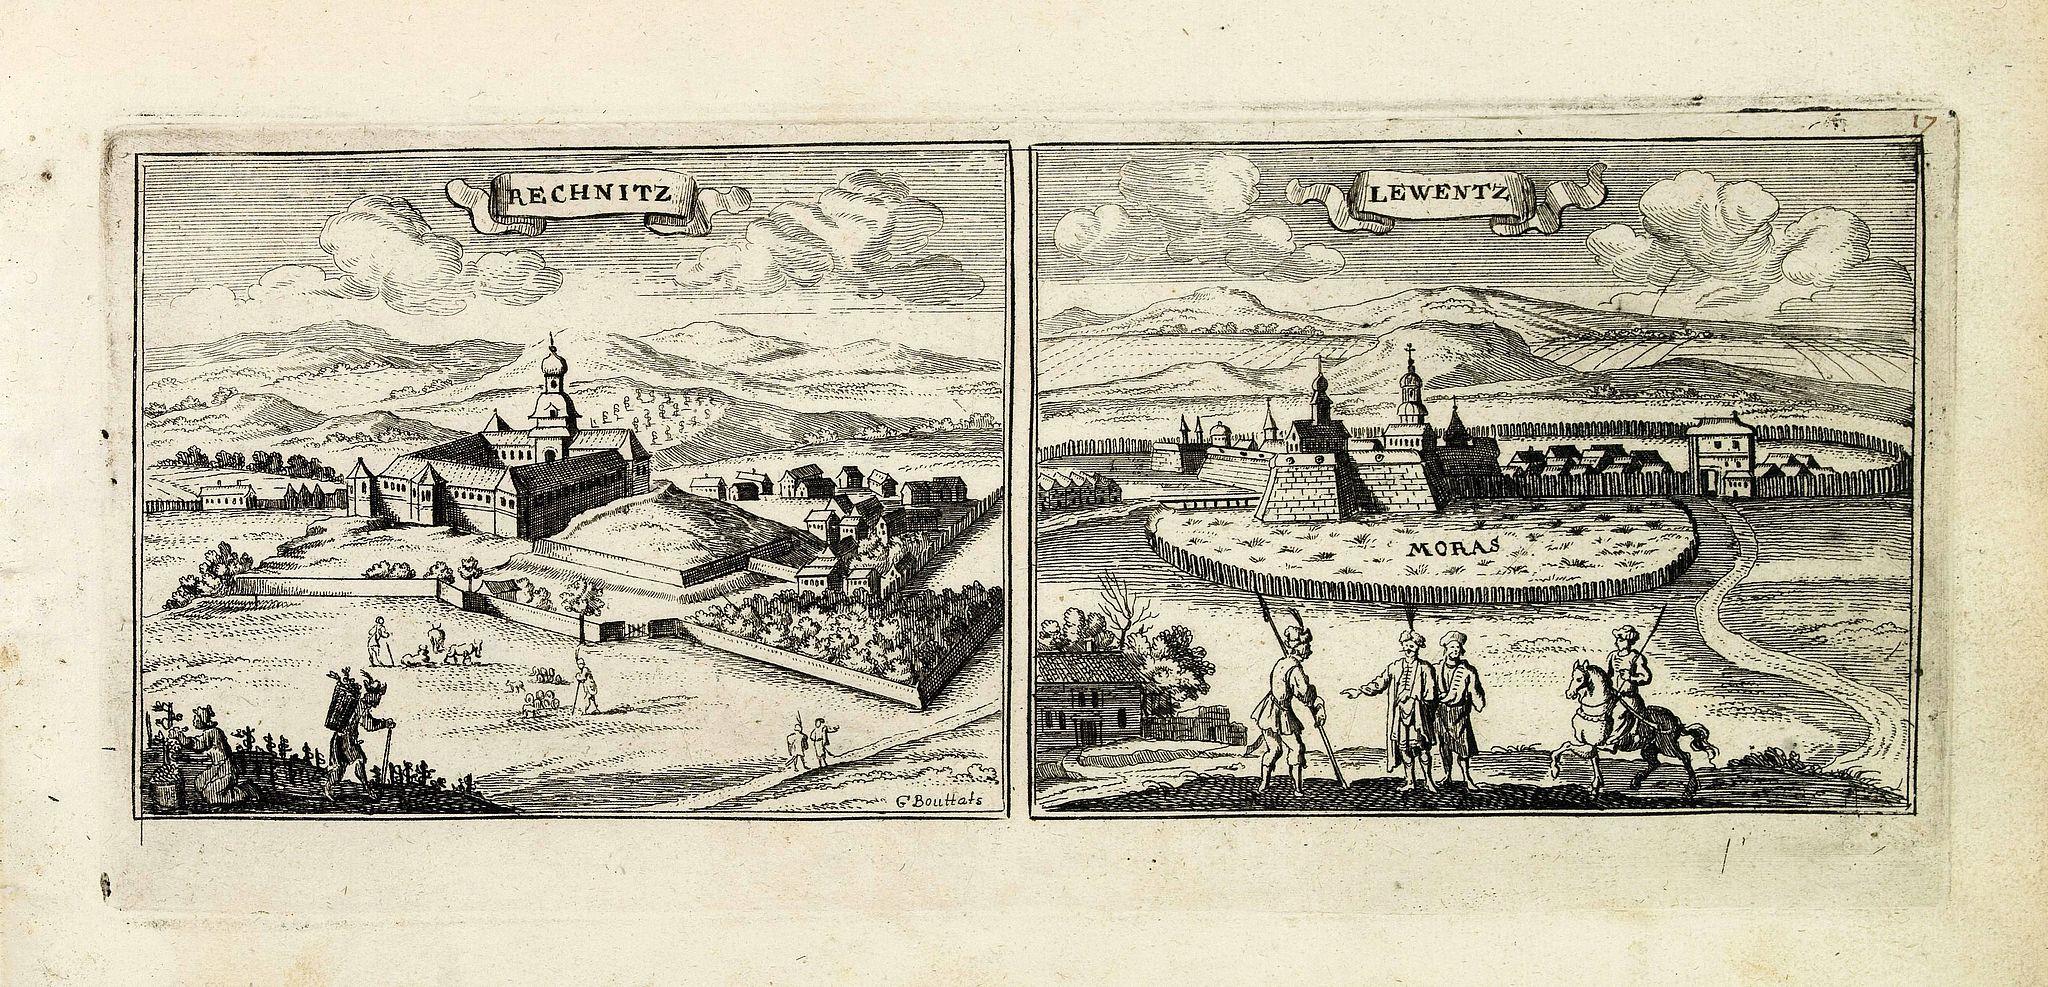 PEETERS, J. / BOUTTATS, G. -  Rechnitz / Lewentz. (Breznica and Levice)